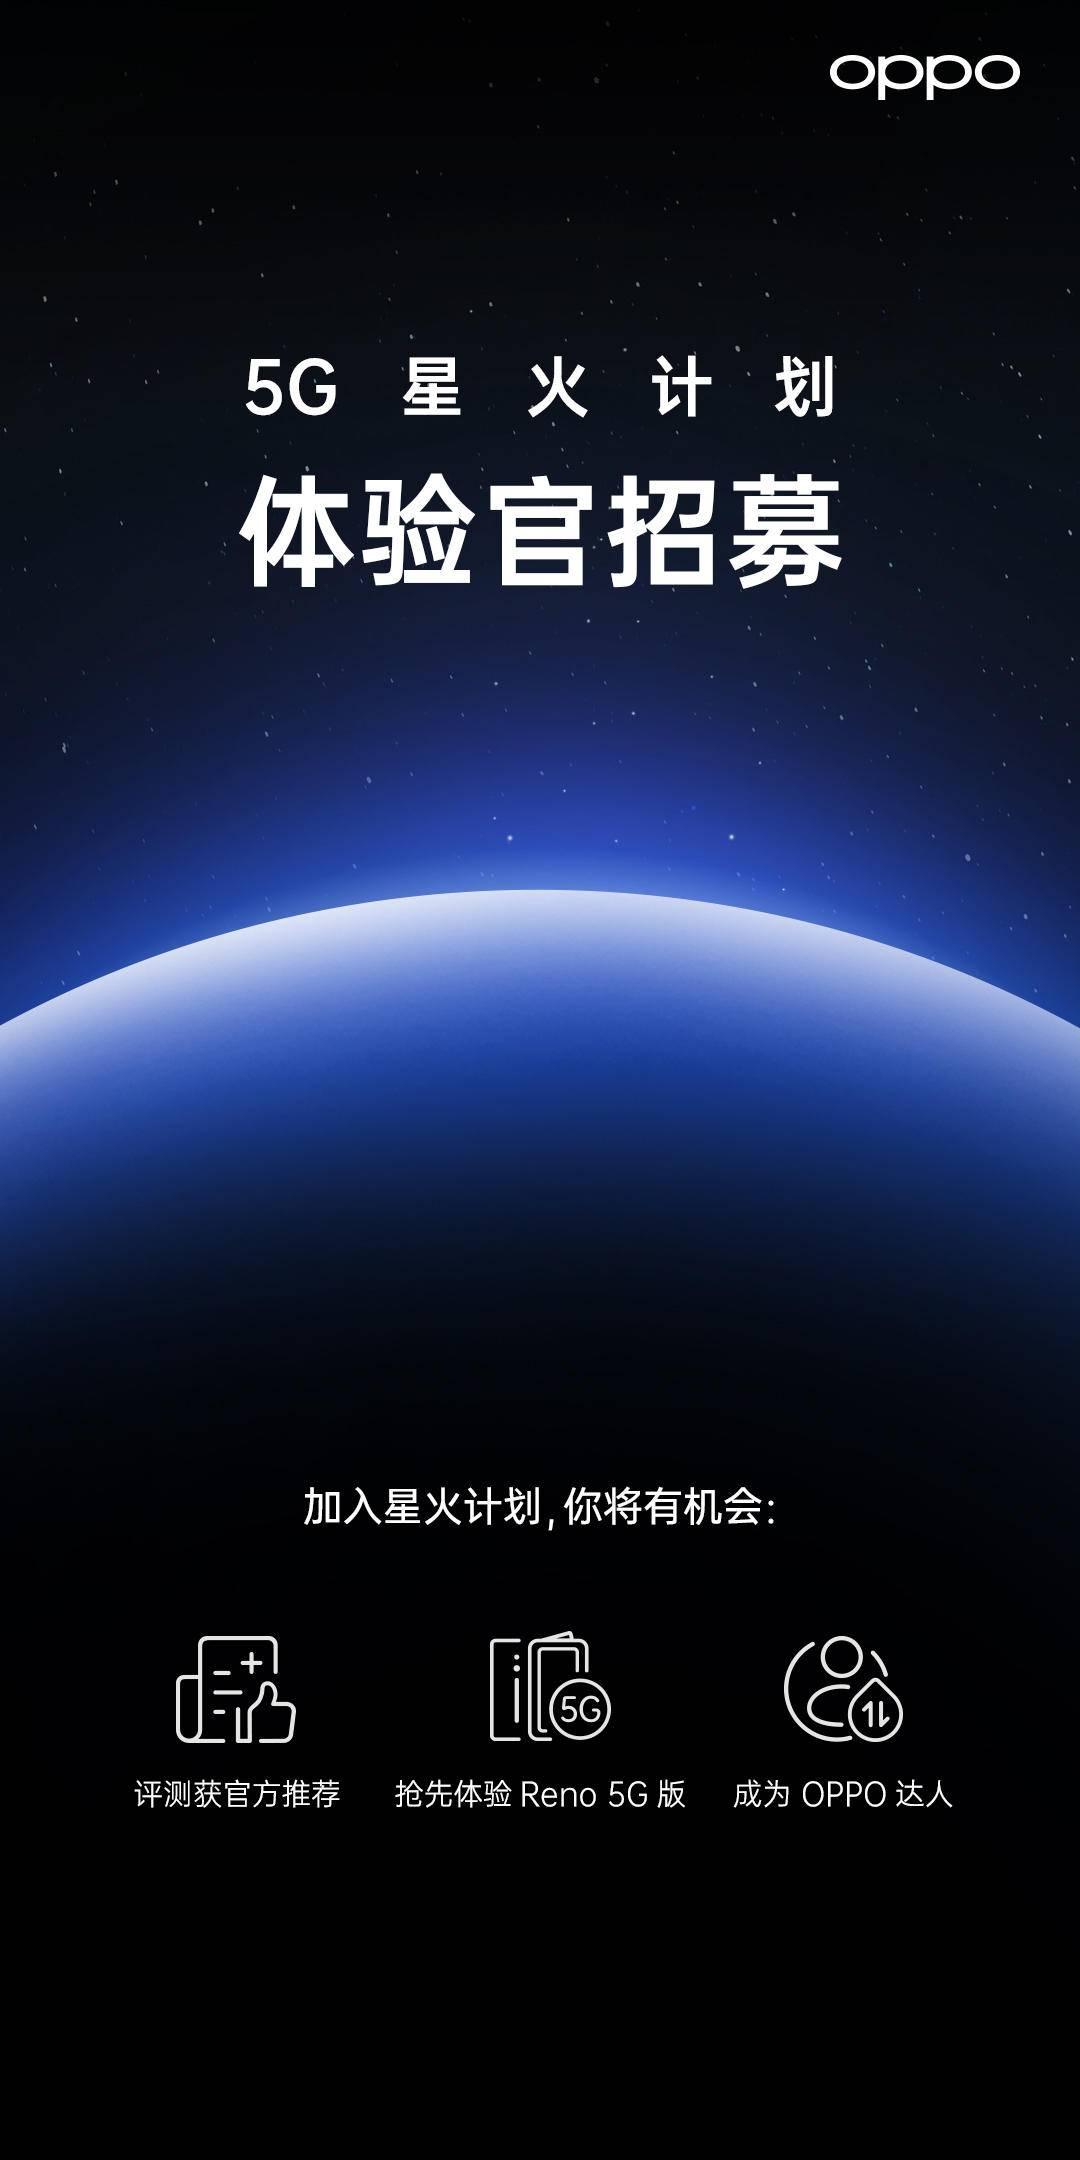 OPPO 5G 星火计划体验官招募全面开启! 想体验5G还等什么